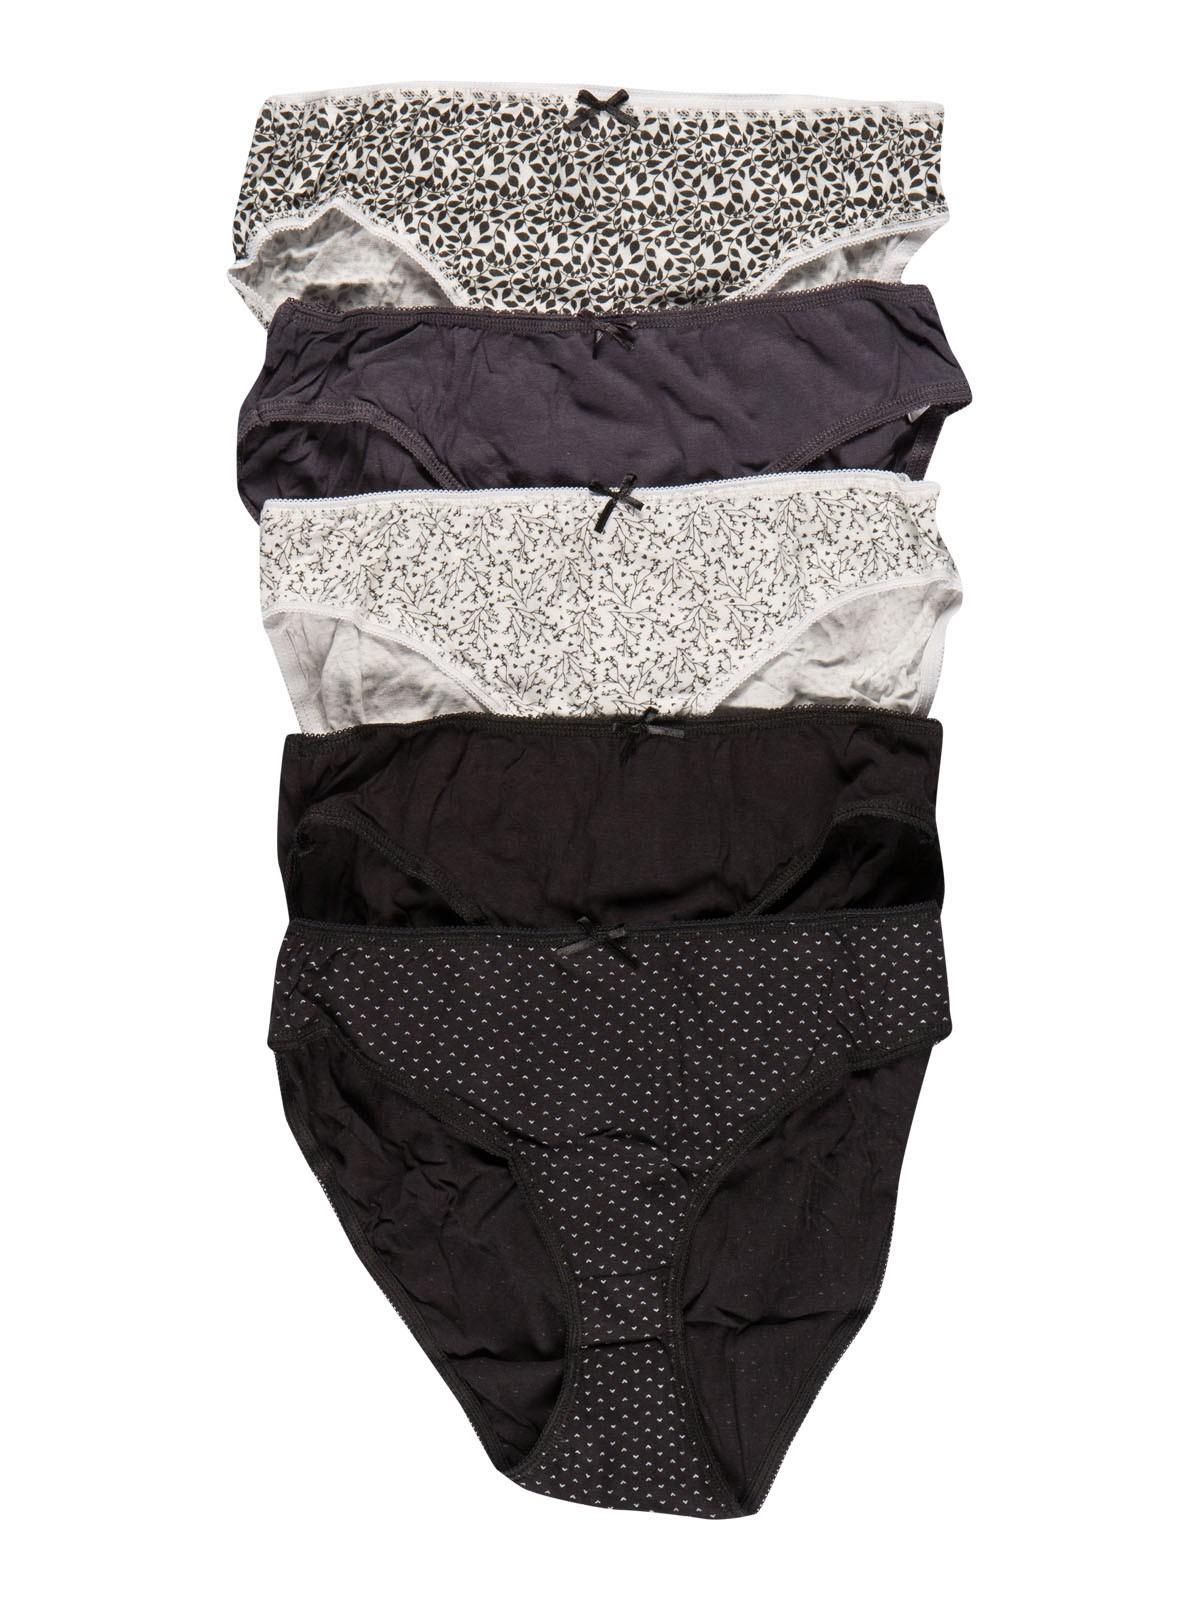 5 culottes unies et imprim es 100 coton districenter. Black Bedroom Furniture Sets. Home Design Ideas